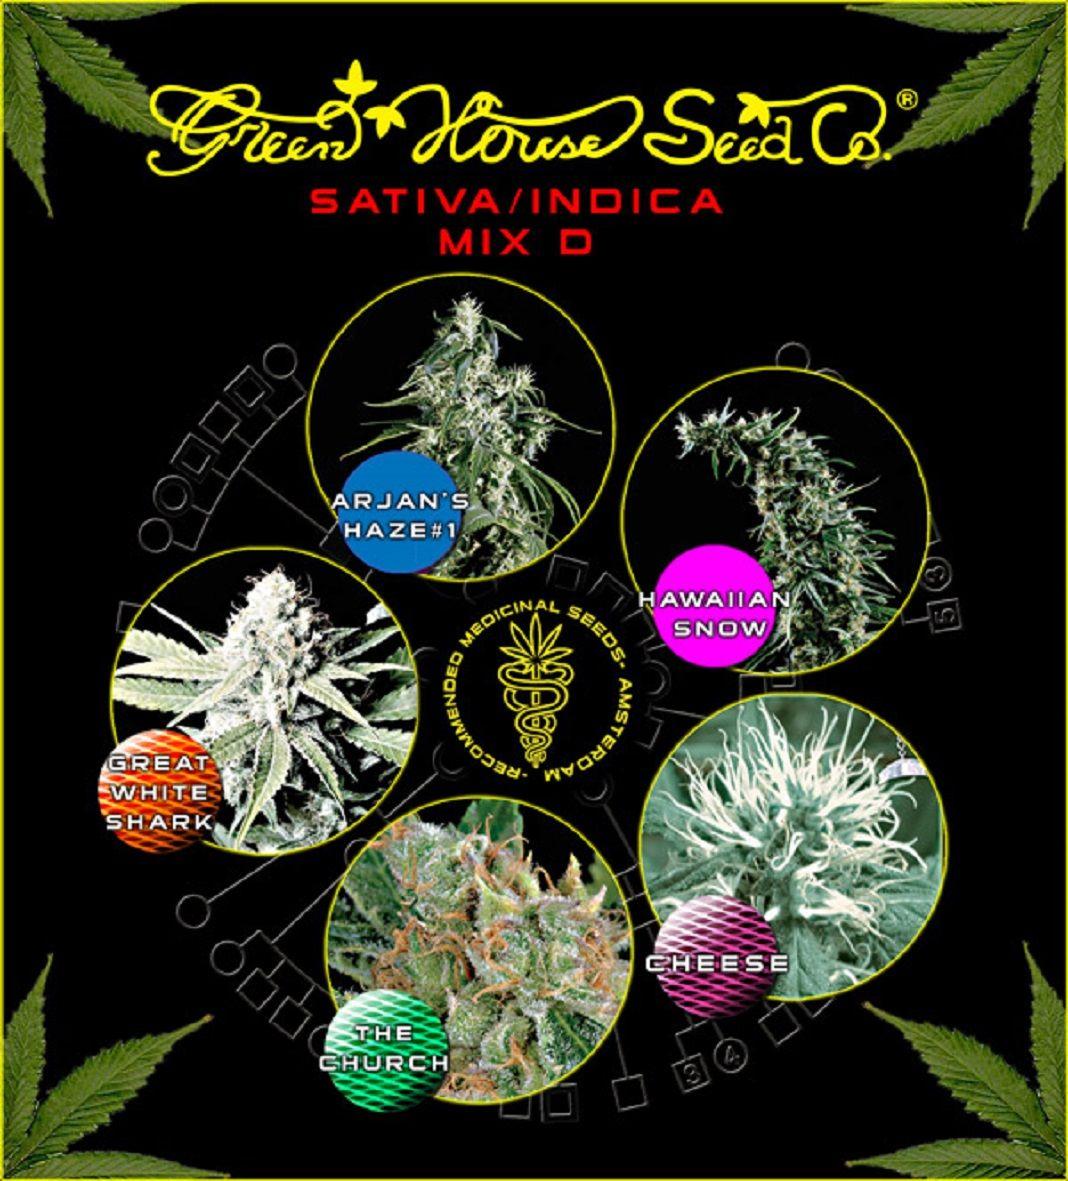 Green House Seeds Sativa/Indica Mix D